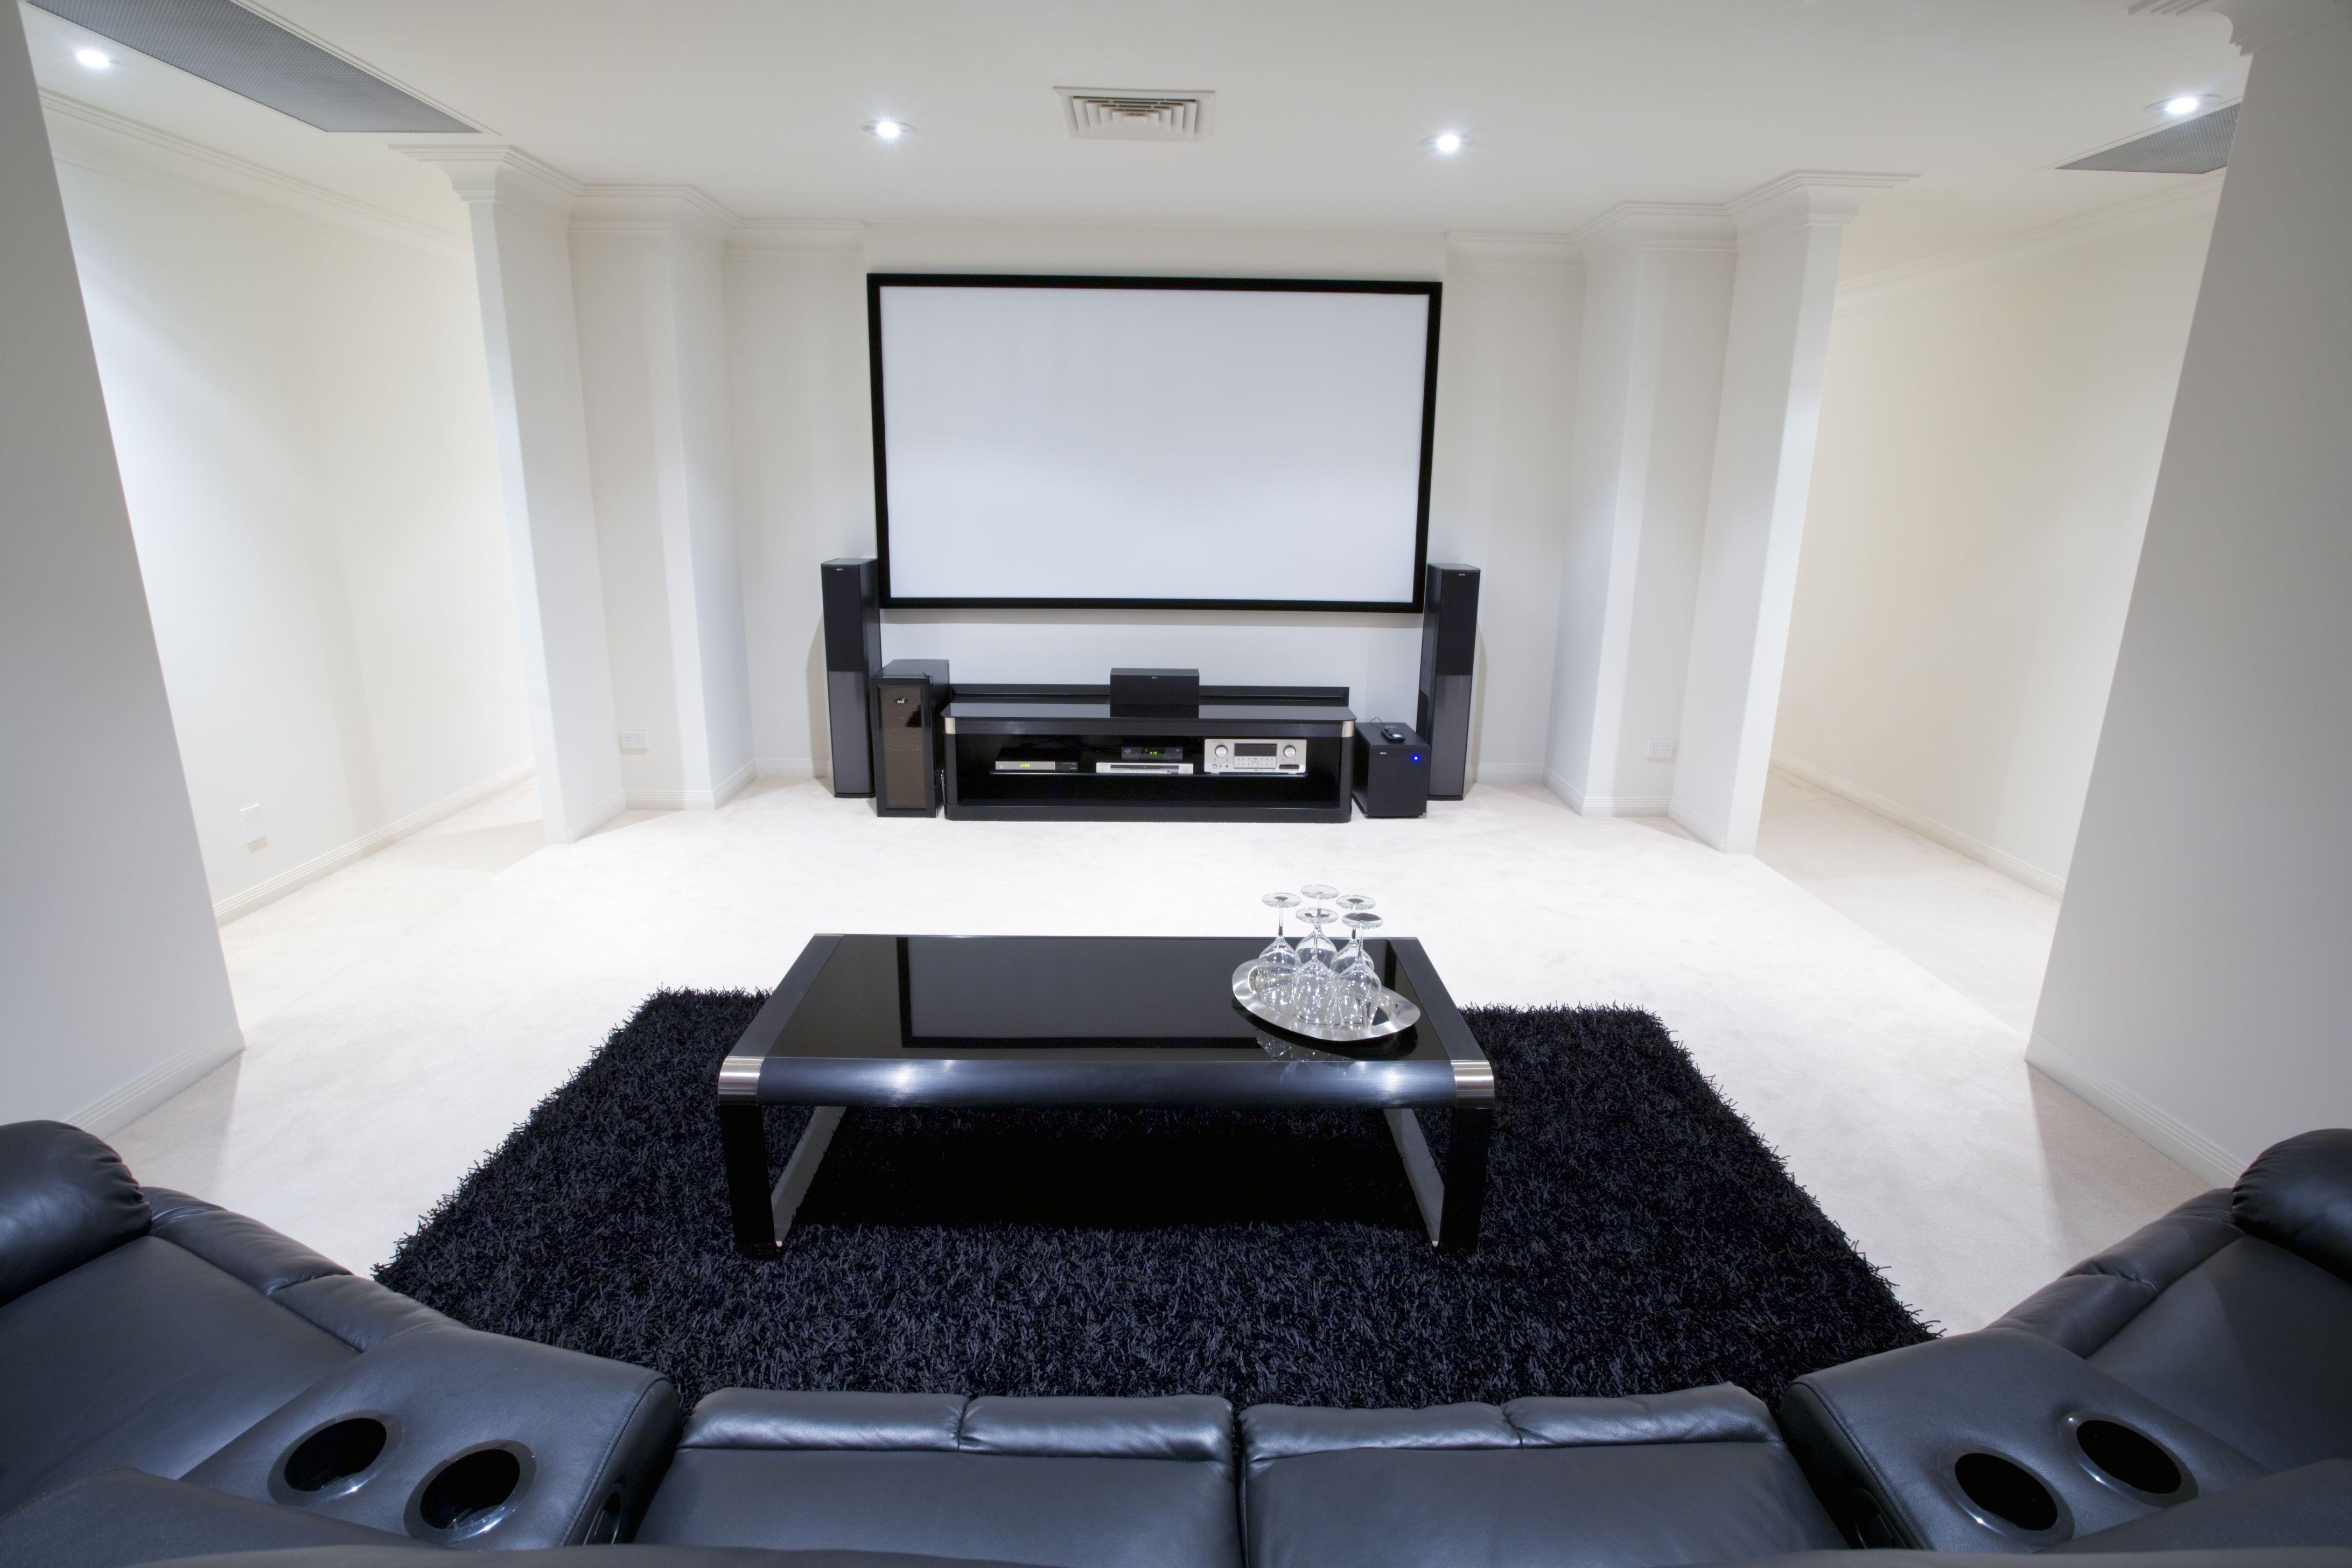 Fine Home Cinema Room Design Gallery - Home Decorating Ideas ...